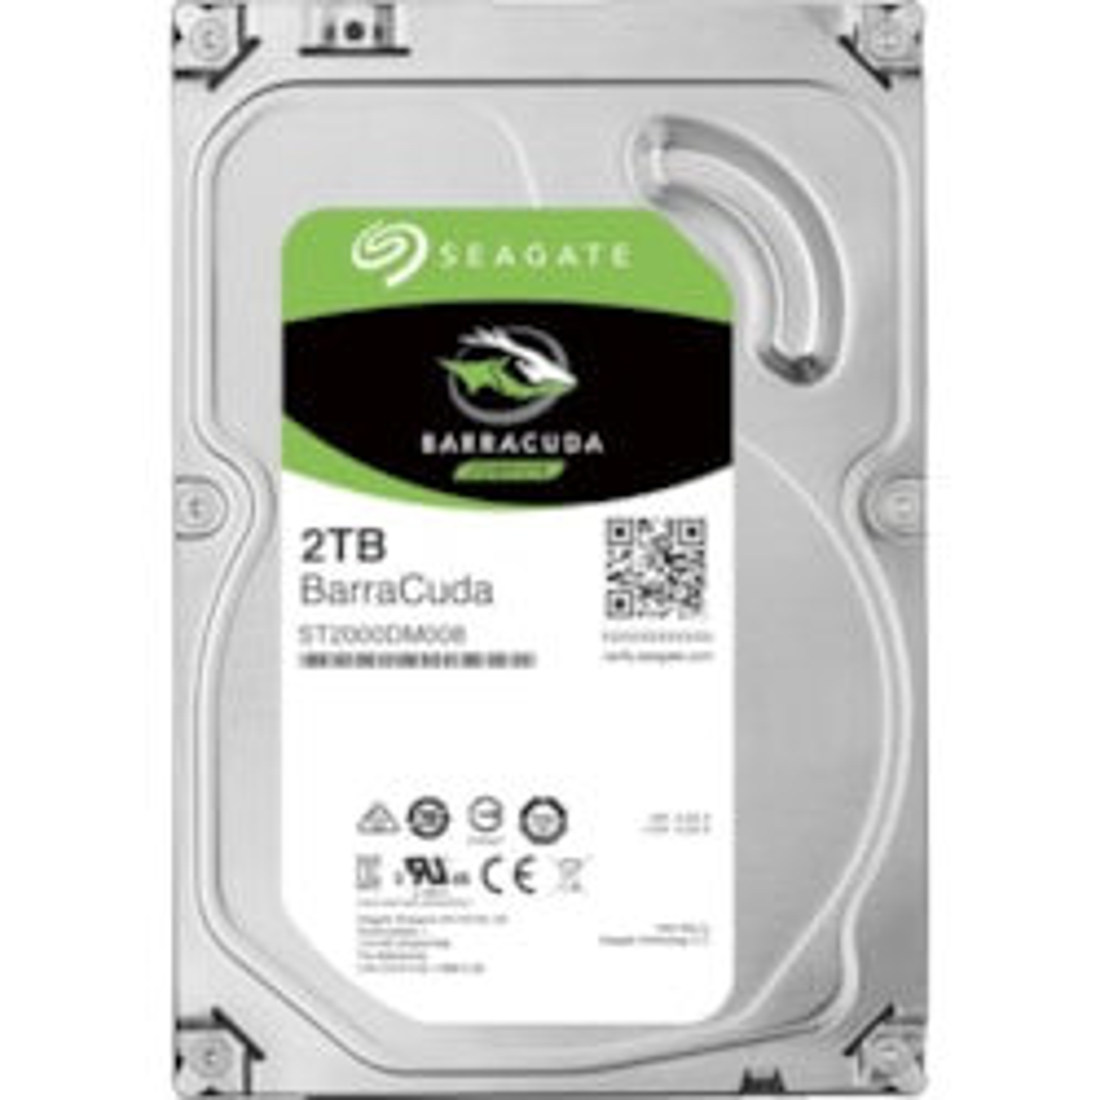 "Seagate BarraCuda ST2000DM008 2 TB Hard Drive - 3.5"" Internal - SATA (SATA/600)"